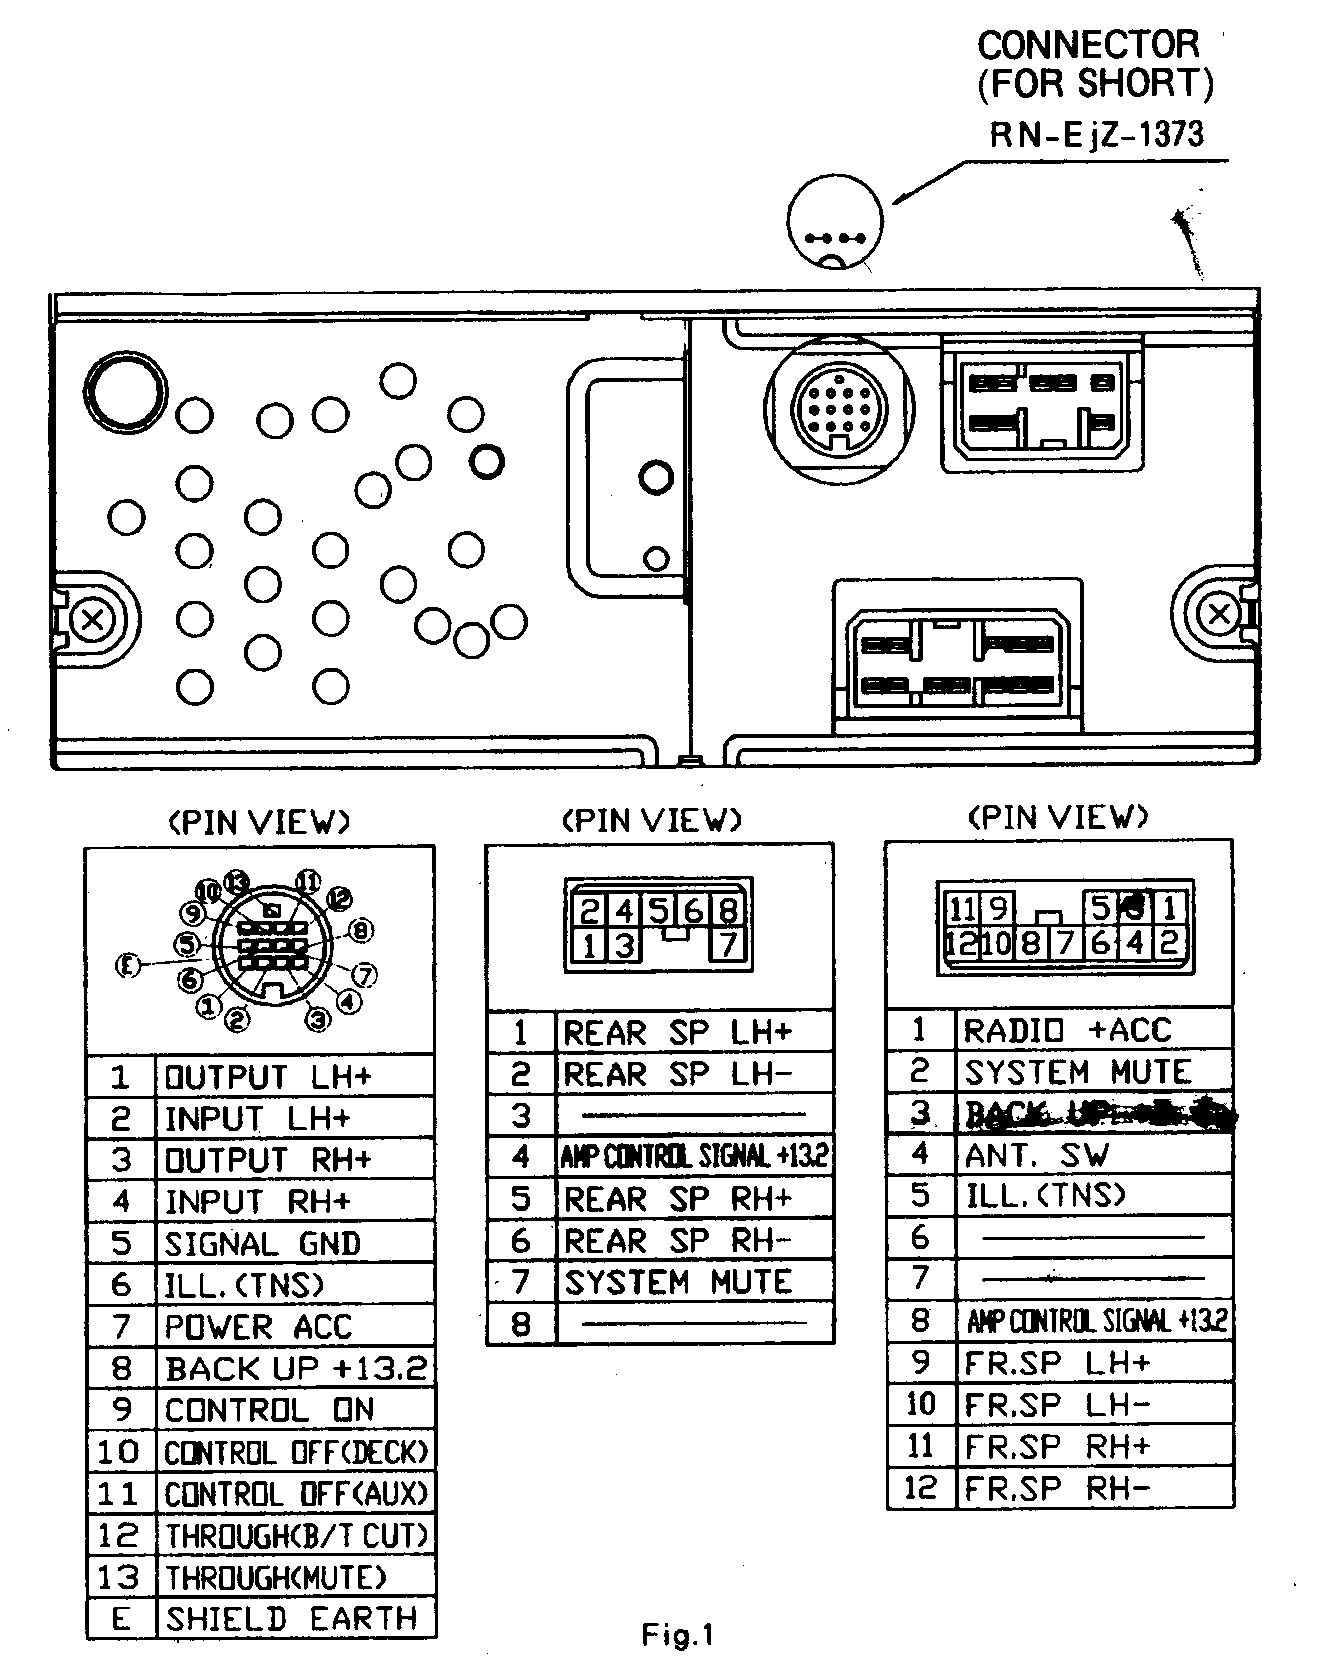 Mazda Car Stereo Wiring - Wiring Diagram Data - Sony Car Stereo Wiring Diagram